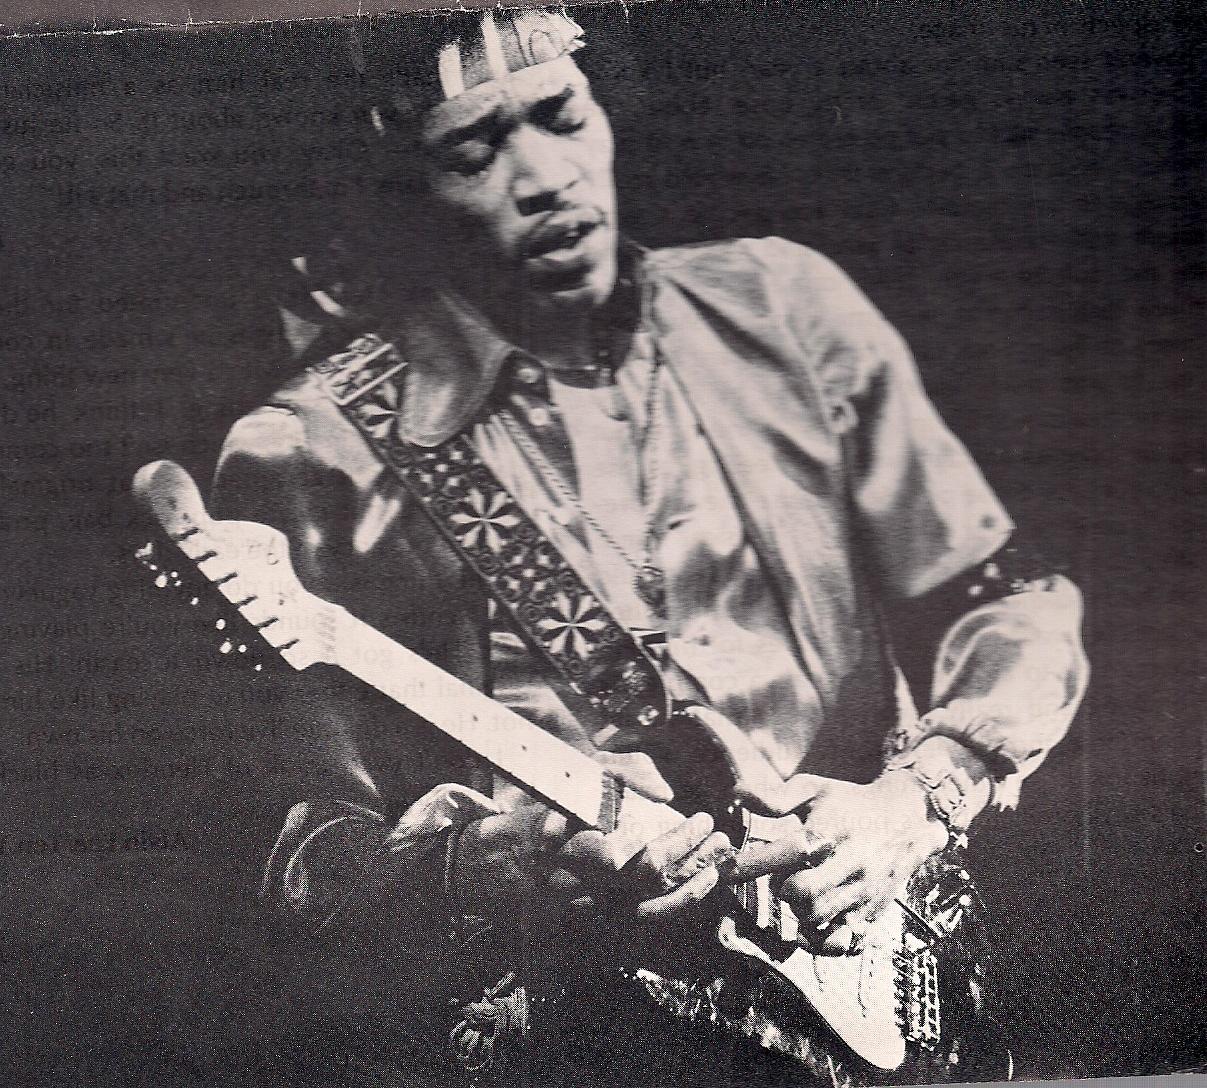 New York (Fillmore East) : 1er janvier 1970 [Premier concert]  3dc14592c8d6a98b0def49ccf6d1587d